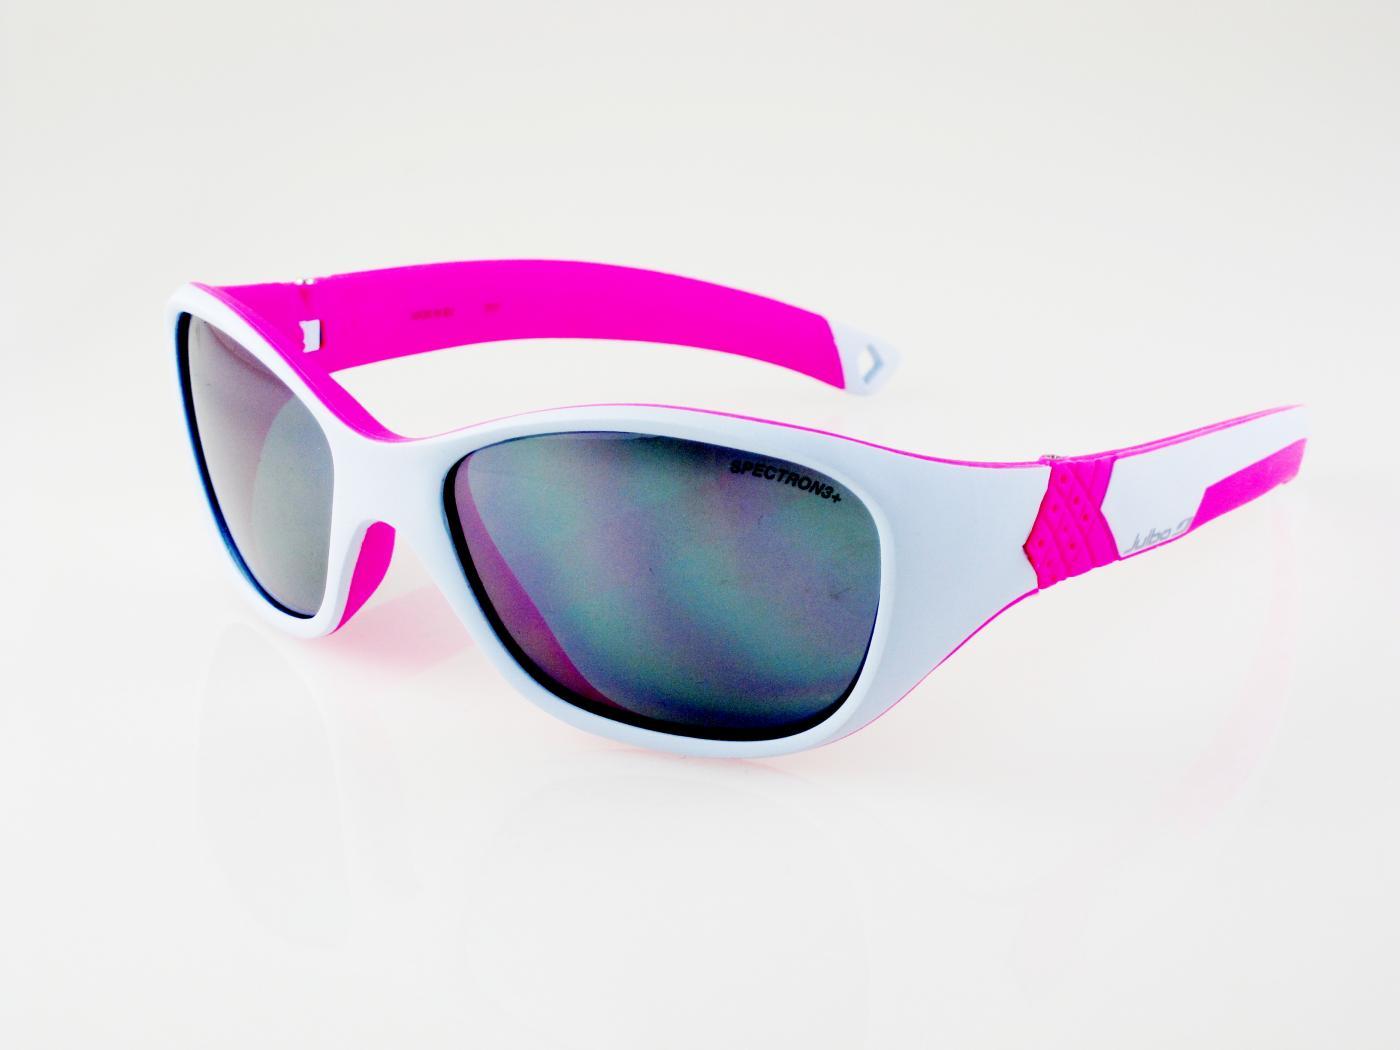 Detské slnečné okuliare Julbo 82a12a4e14d